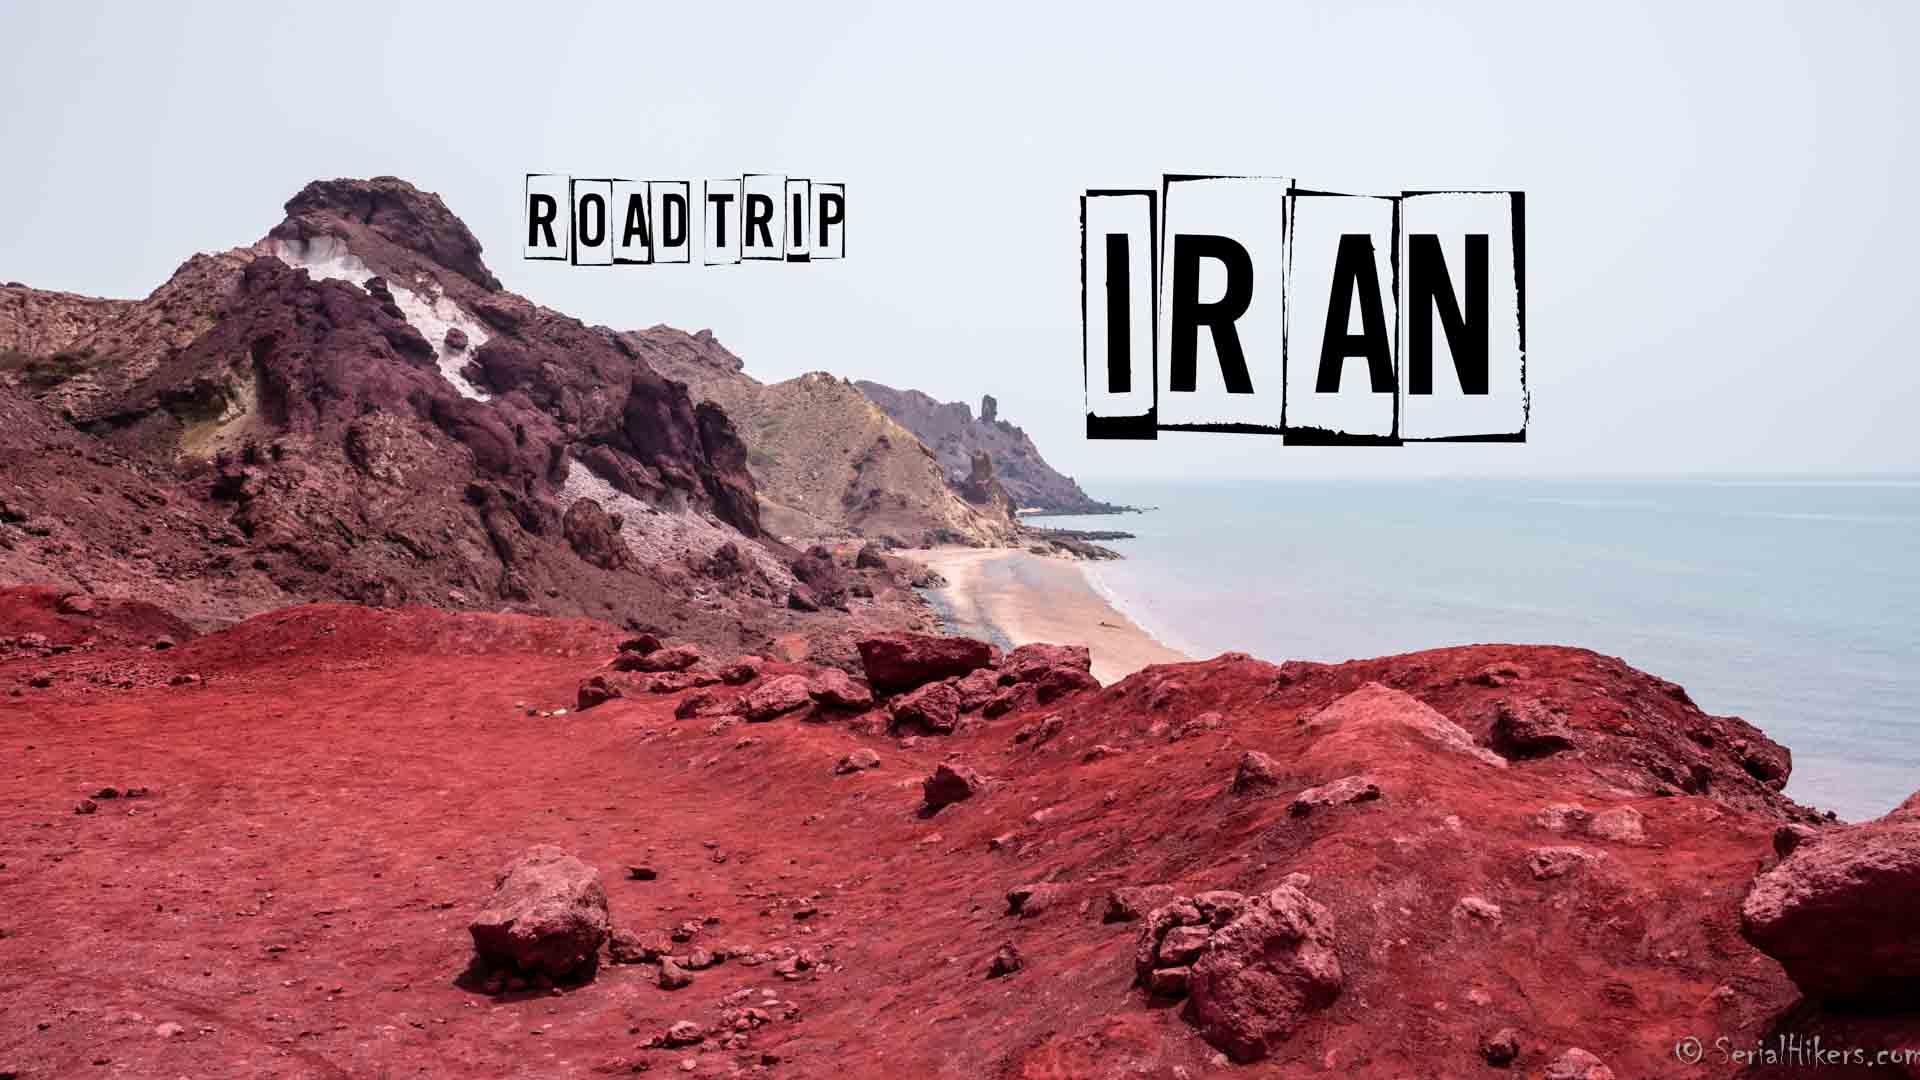 SerialHikers stop autostop world monde tour hitchhiking aventure adventure alternative travel voyage sans avion no fly newsletter Iran Hormuz Hormouz island ile couleurs colors